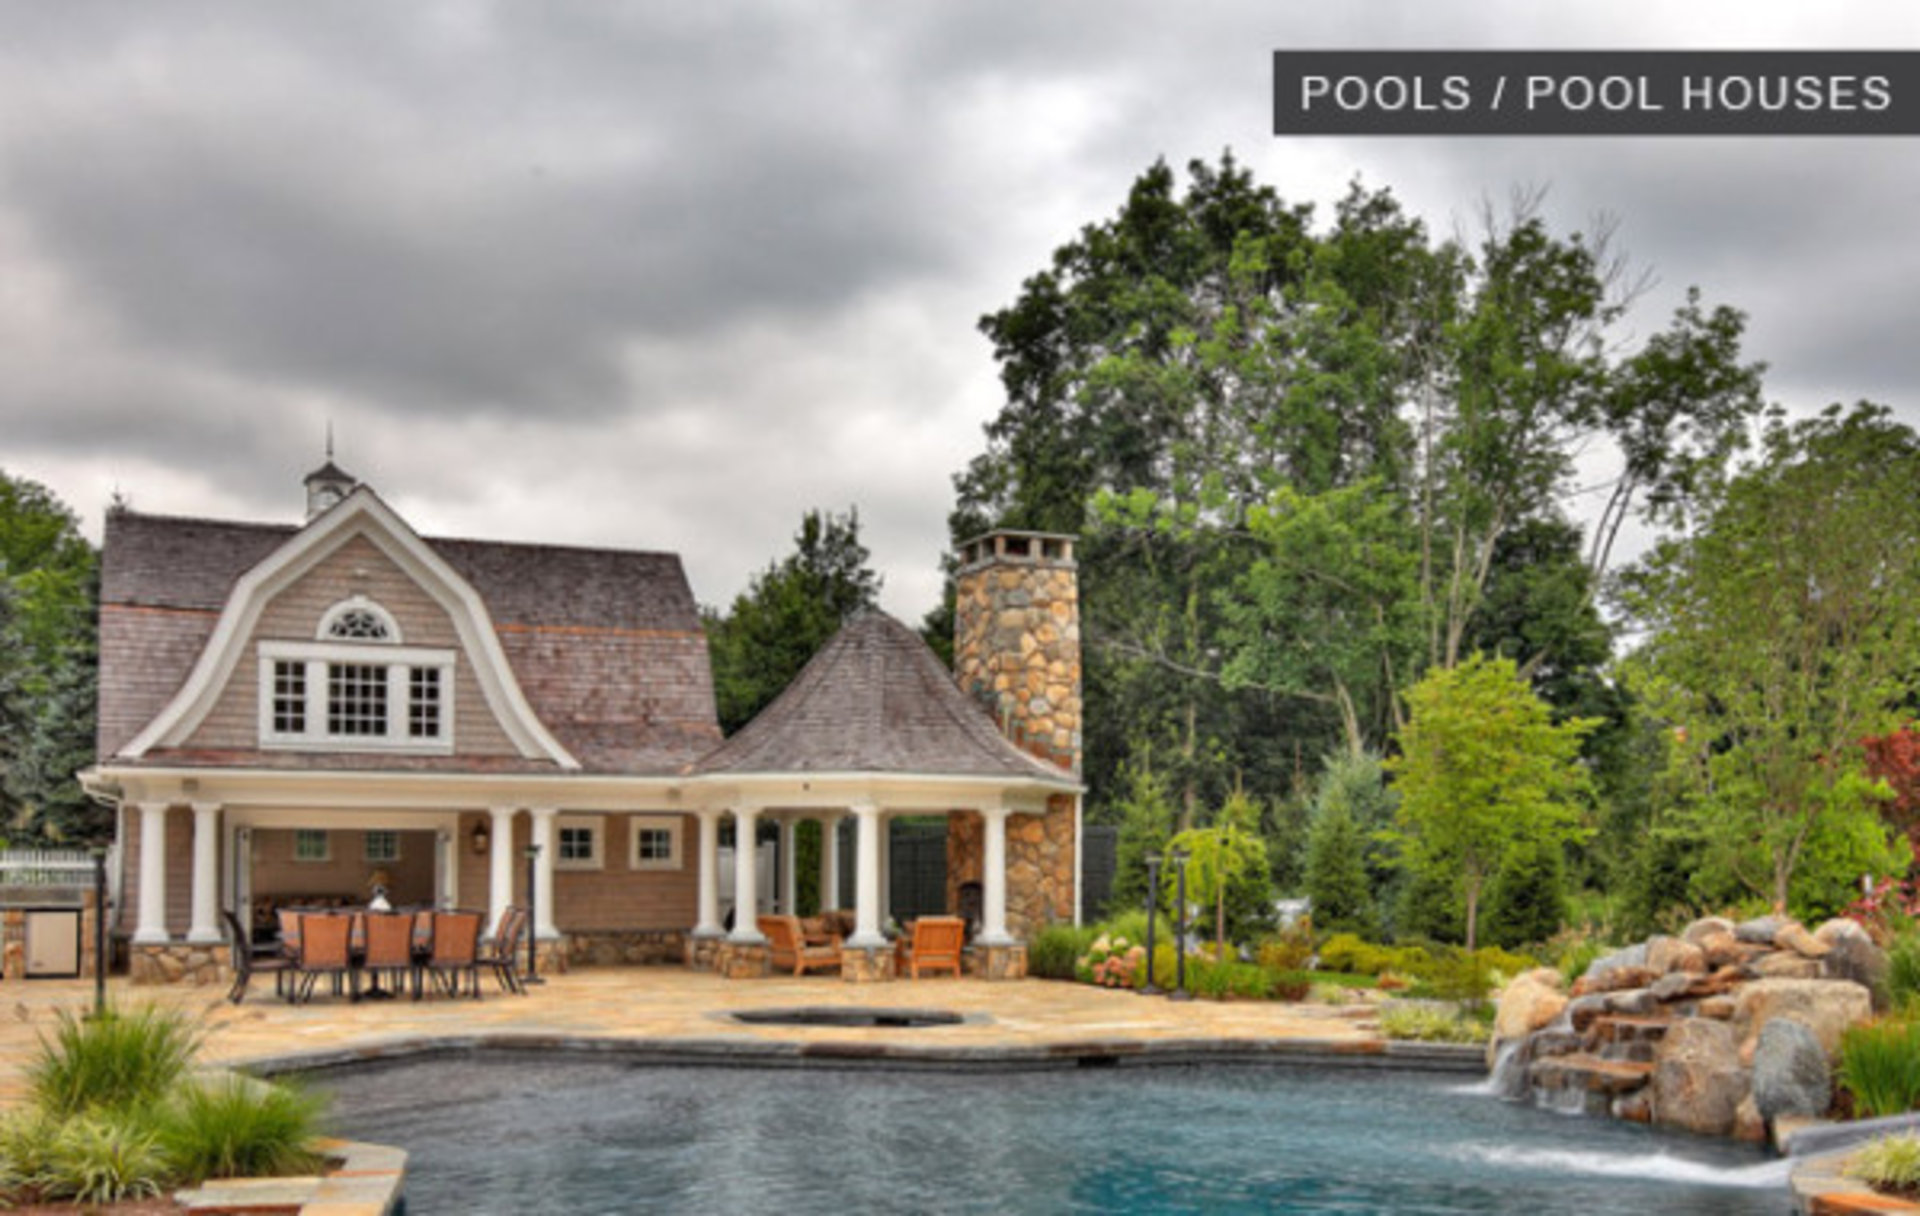 Pools/Pool Houses